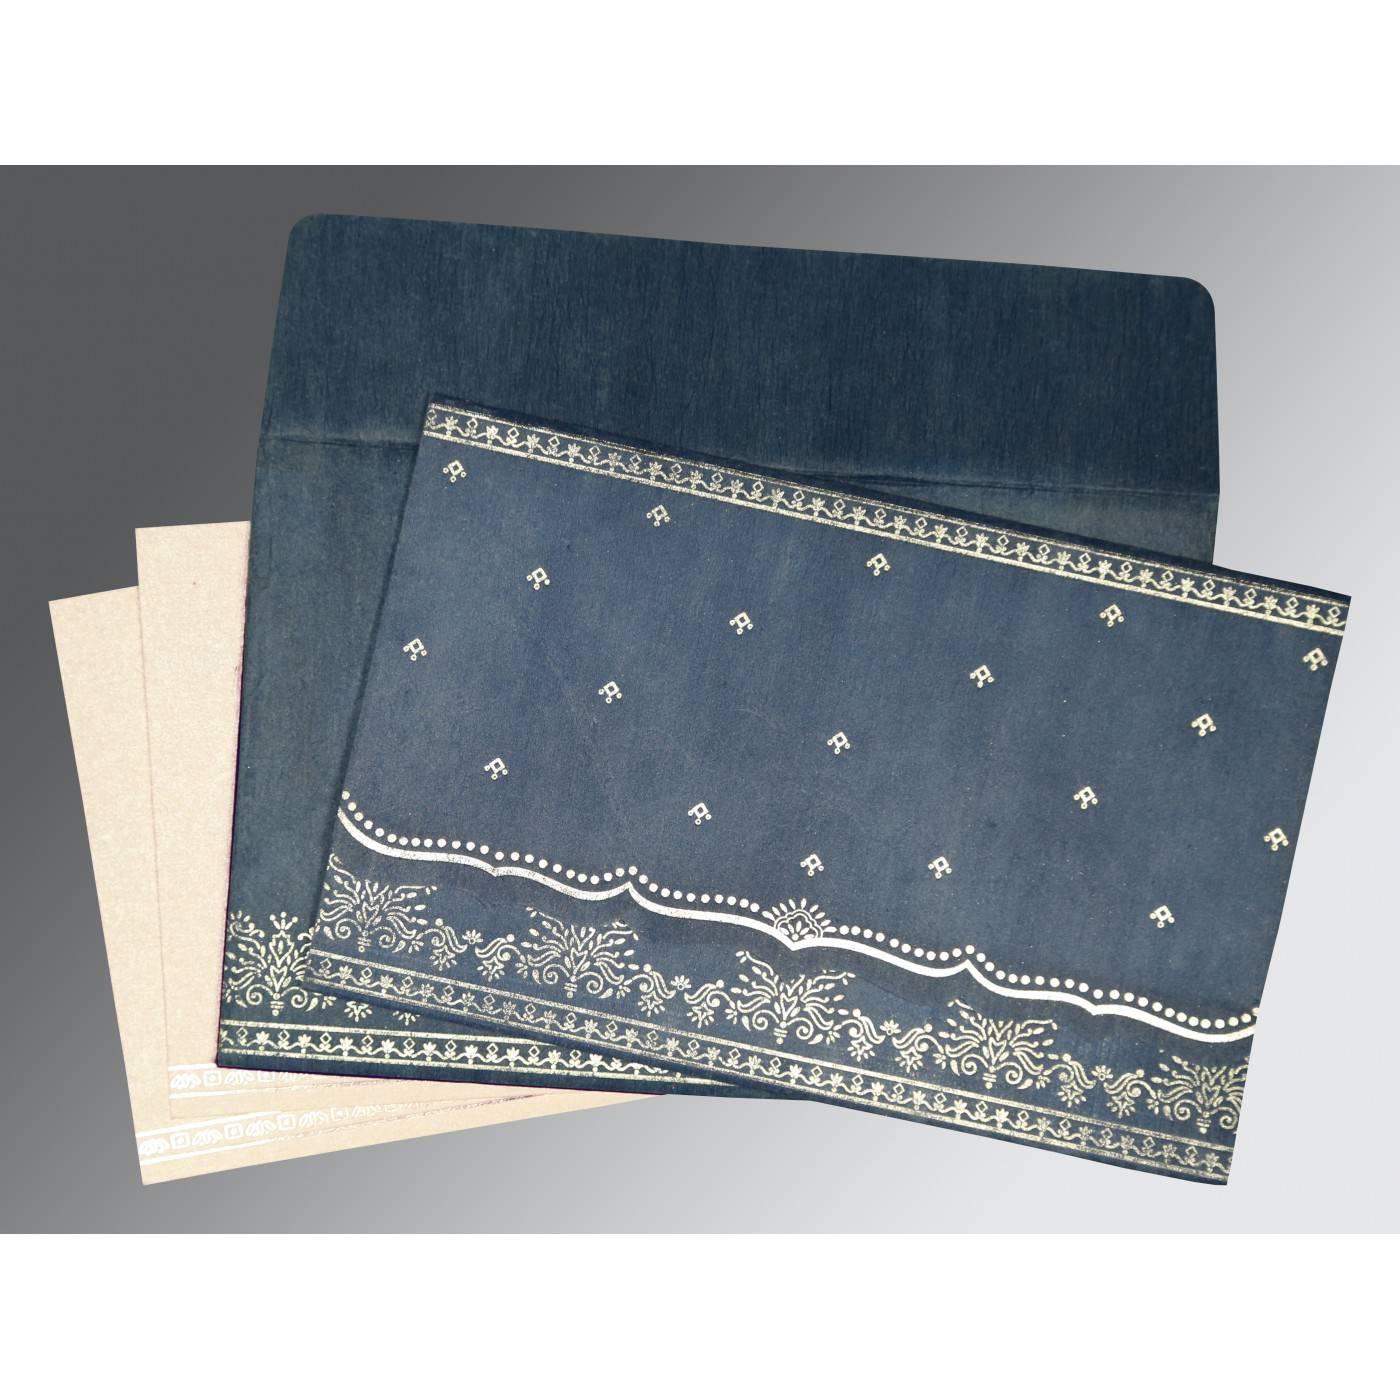 SMOKE BLUE WOOLY FOIL STAMPED WEDDING INVITATION : CW-8241P - IndianWeddingCards